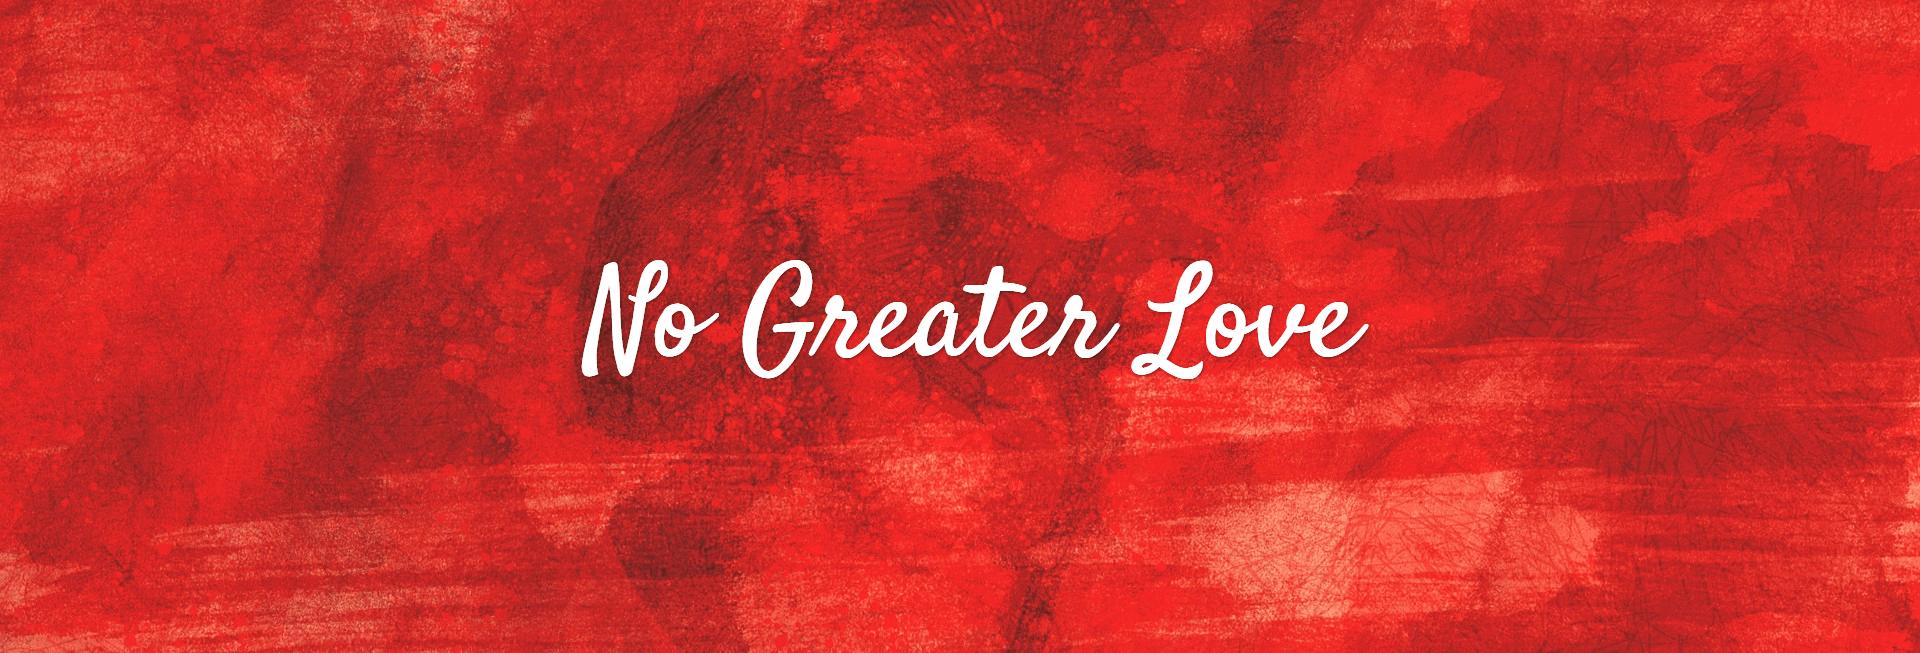 No Greater Love - Bethel Baptist Church